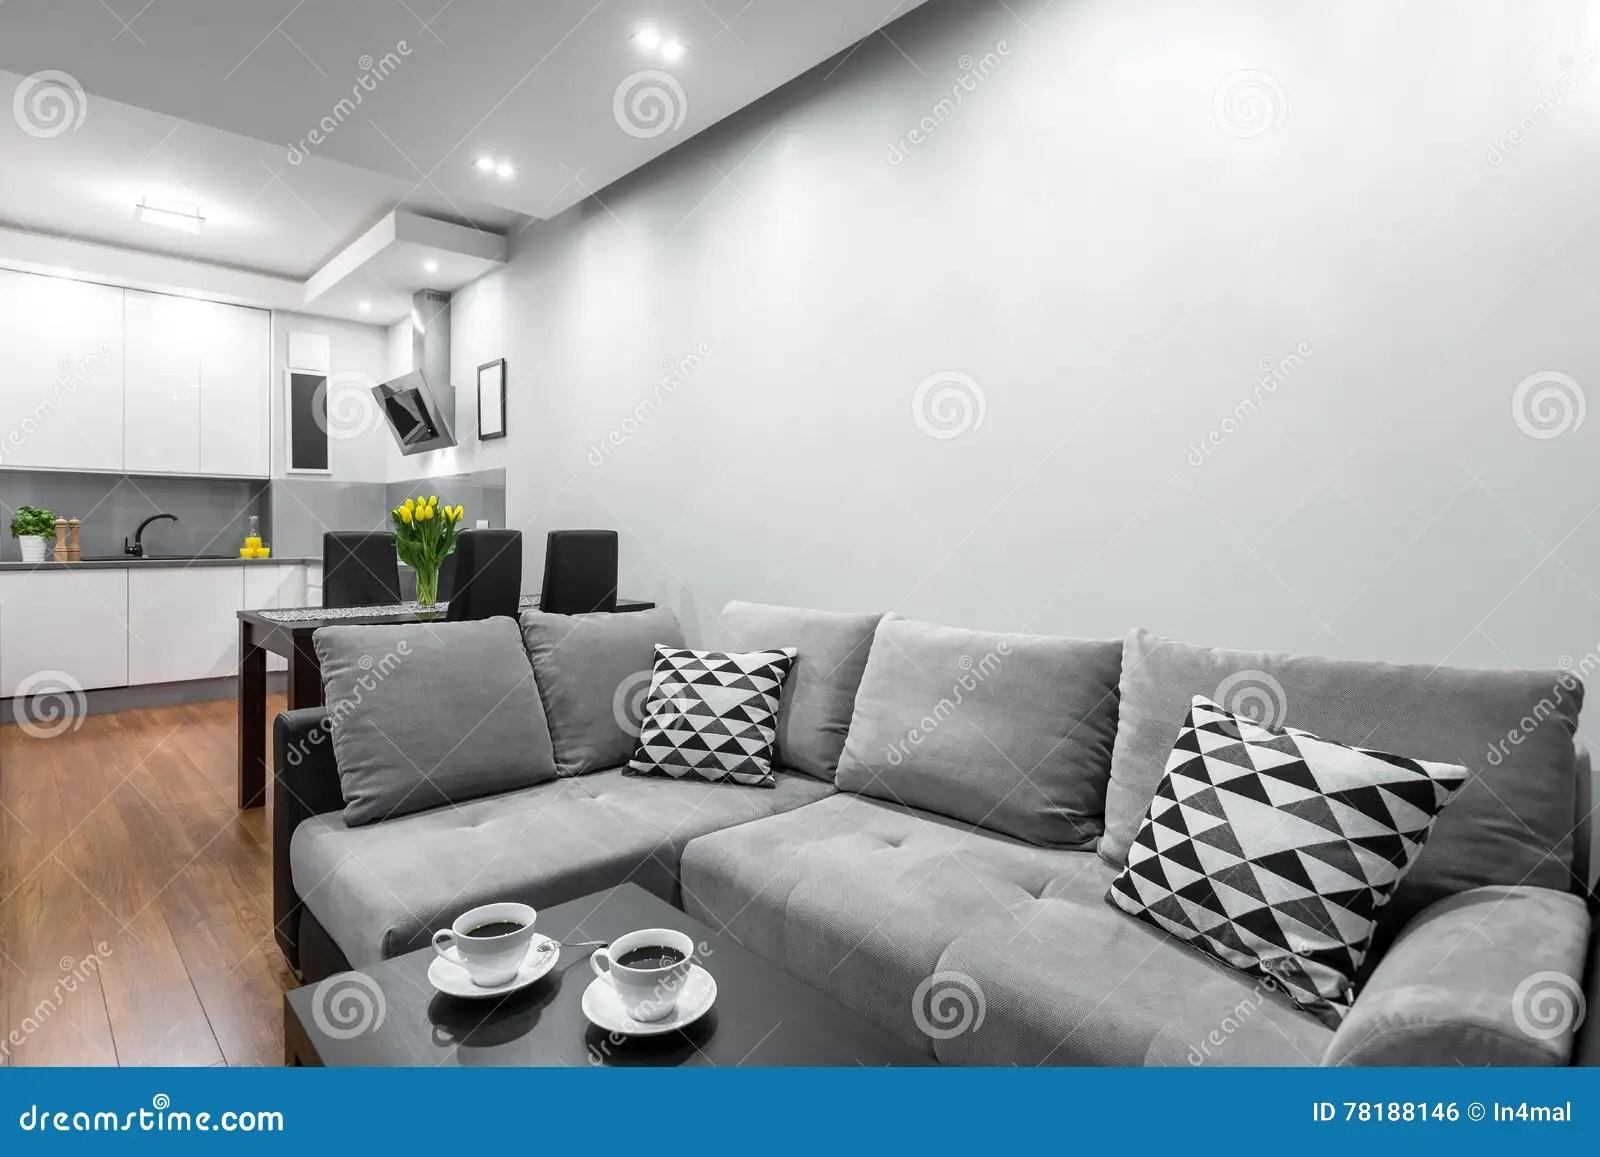 kitchen layout ideas tile backsplashes 现代舱内甲板有开放布局想法库存照片 图片包括有beautifuler 理想 与大沙发 黑暗的用餐的集合和光开放厨房的新式的家庭内部